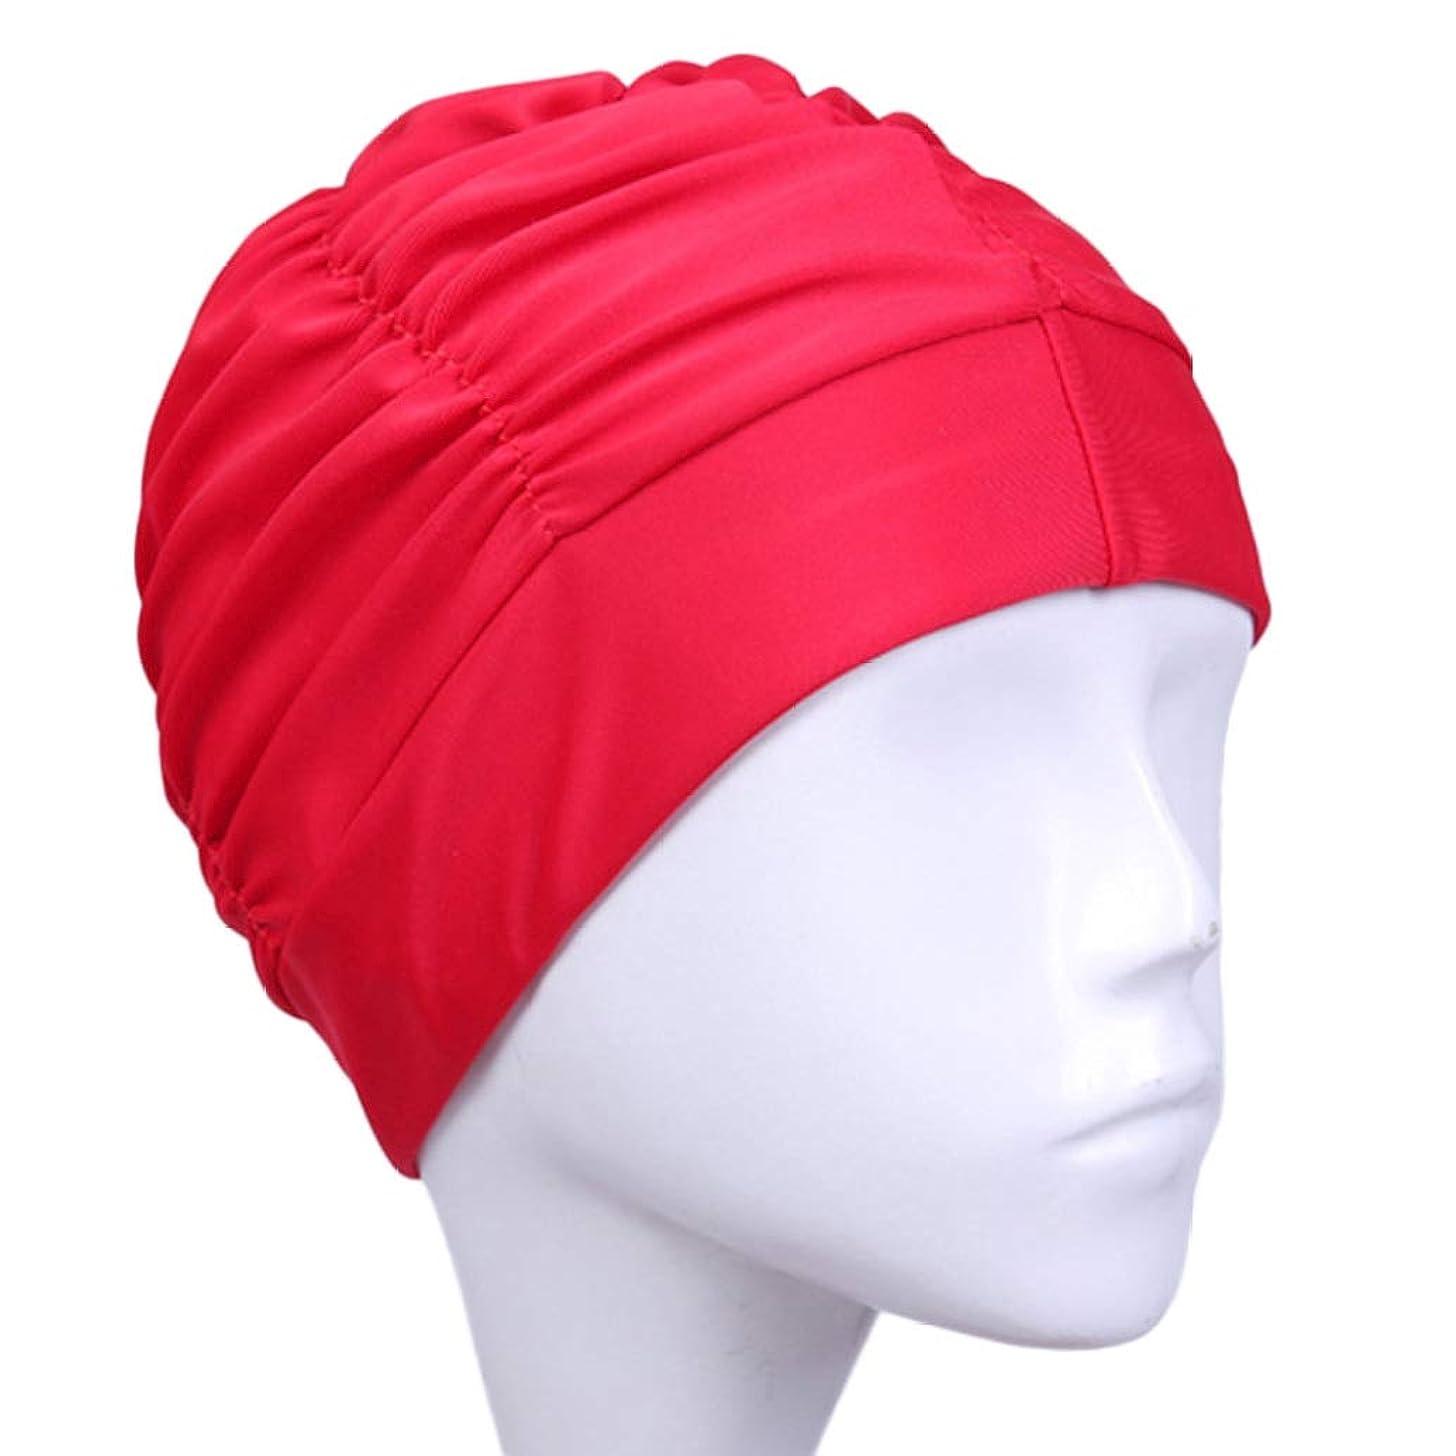 BOWINUS Swimming Cap Long Hair Sports Swim Pool Hat Elastic Nylon Turban for Men & Women